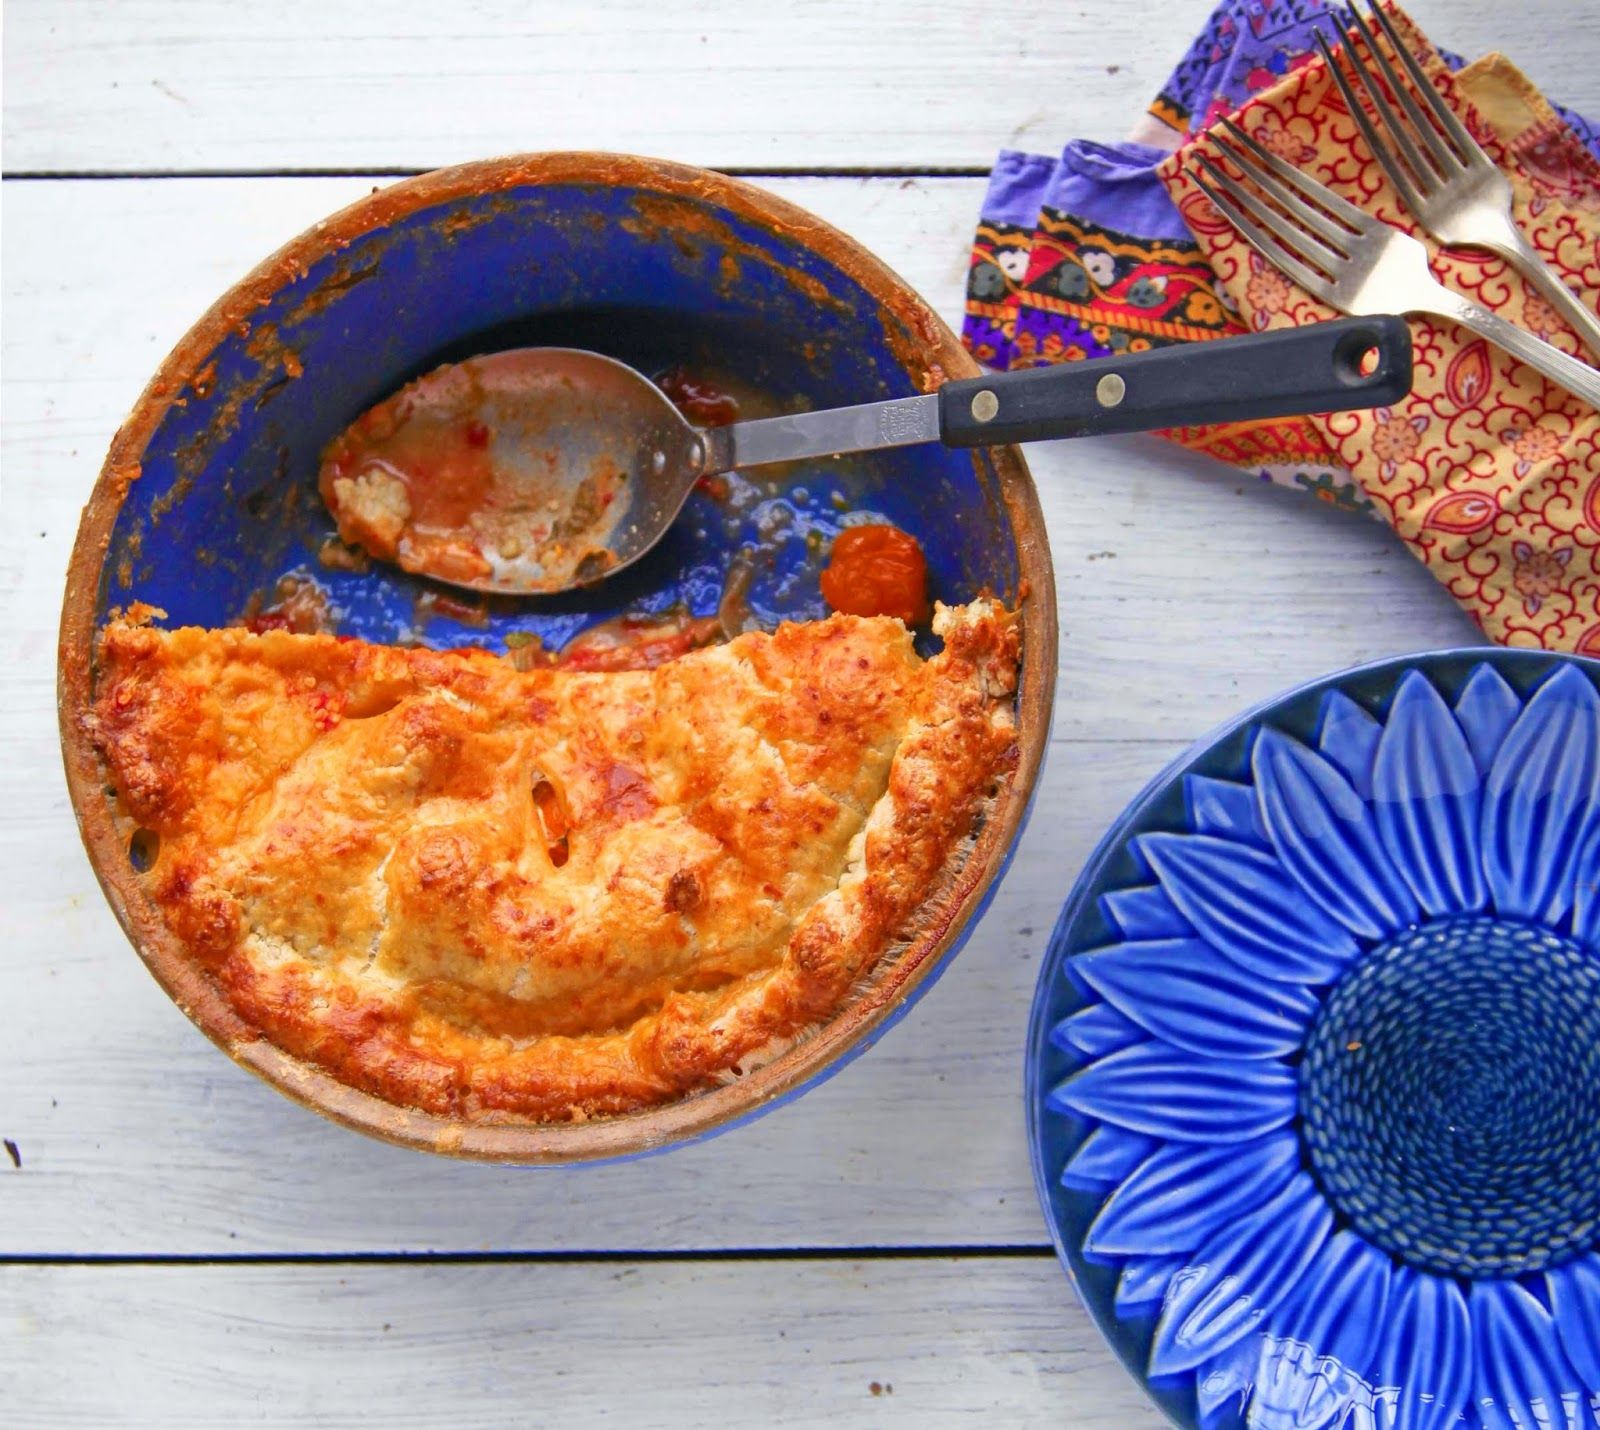 Recipe on Kristin Nicholas' blog Getting Stitched on the Farm: Tomato Pie - A Delicious Recipe for Late Summer